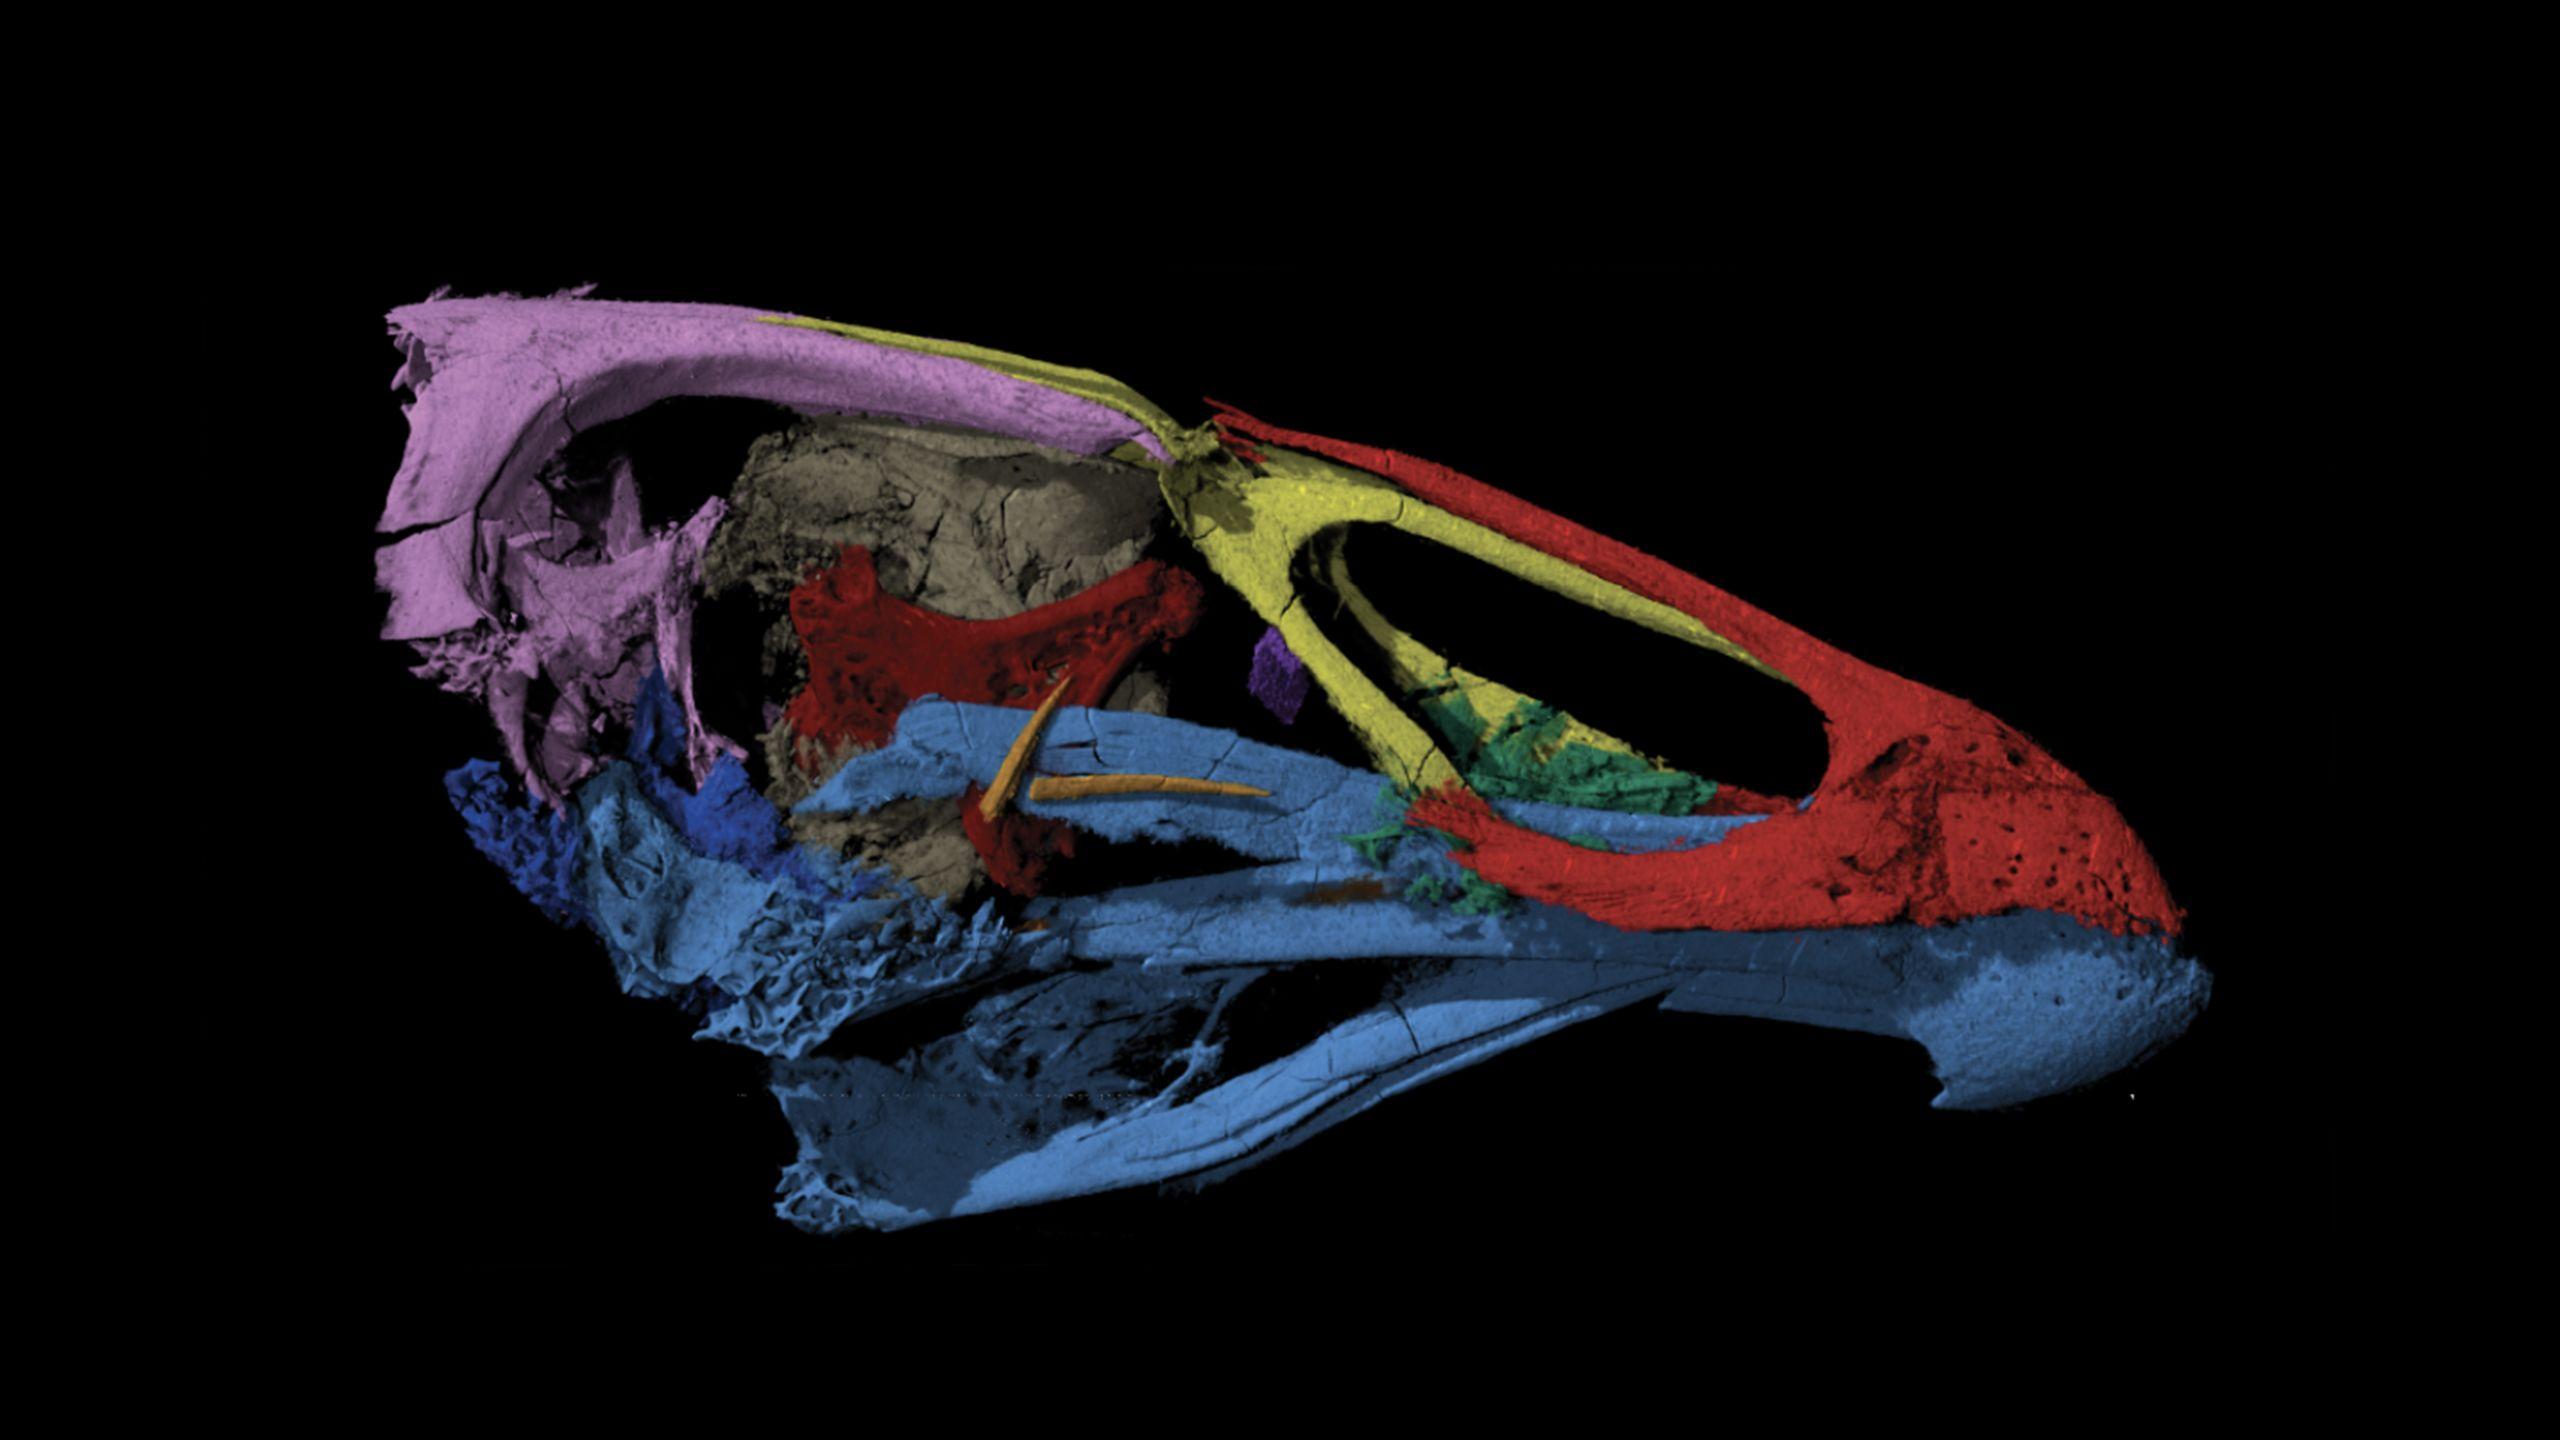 skull-in-side-view-2560x1440